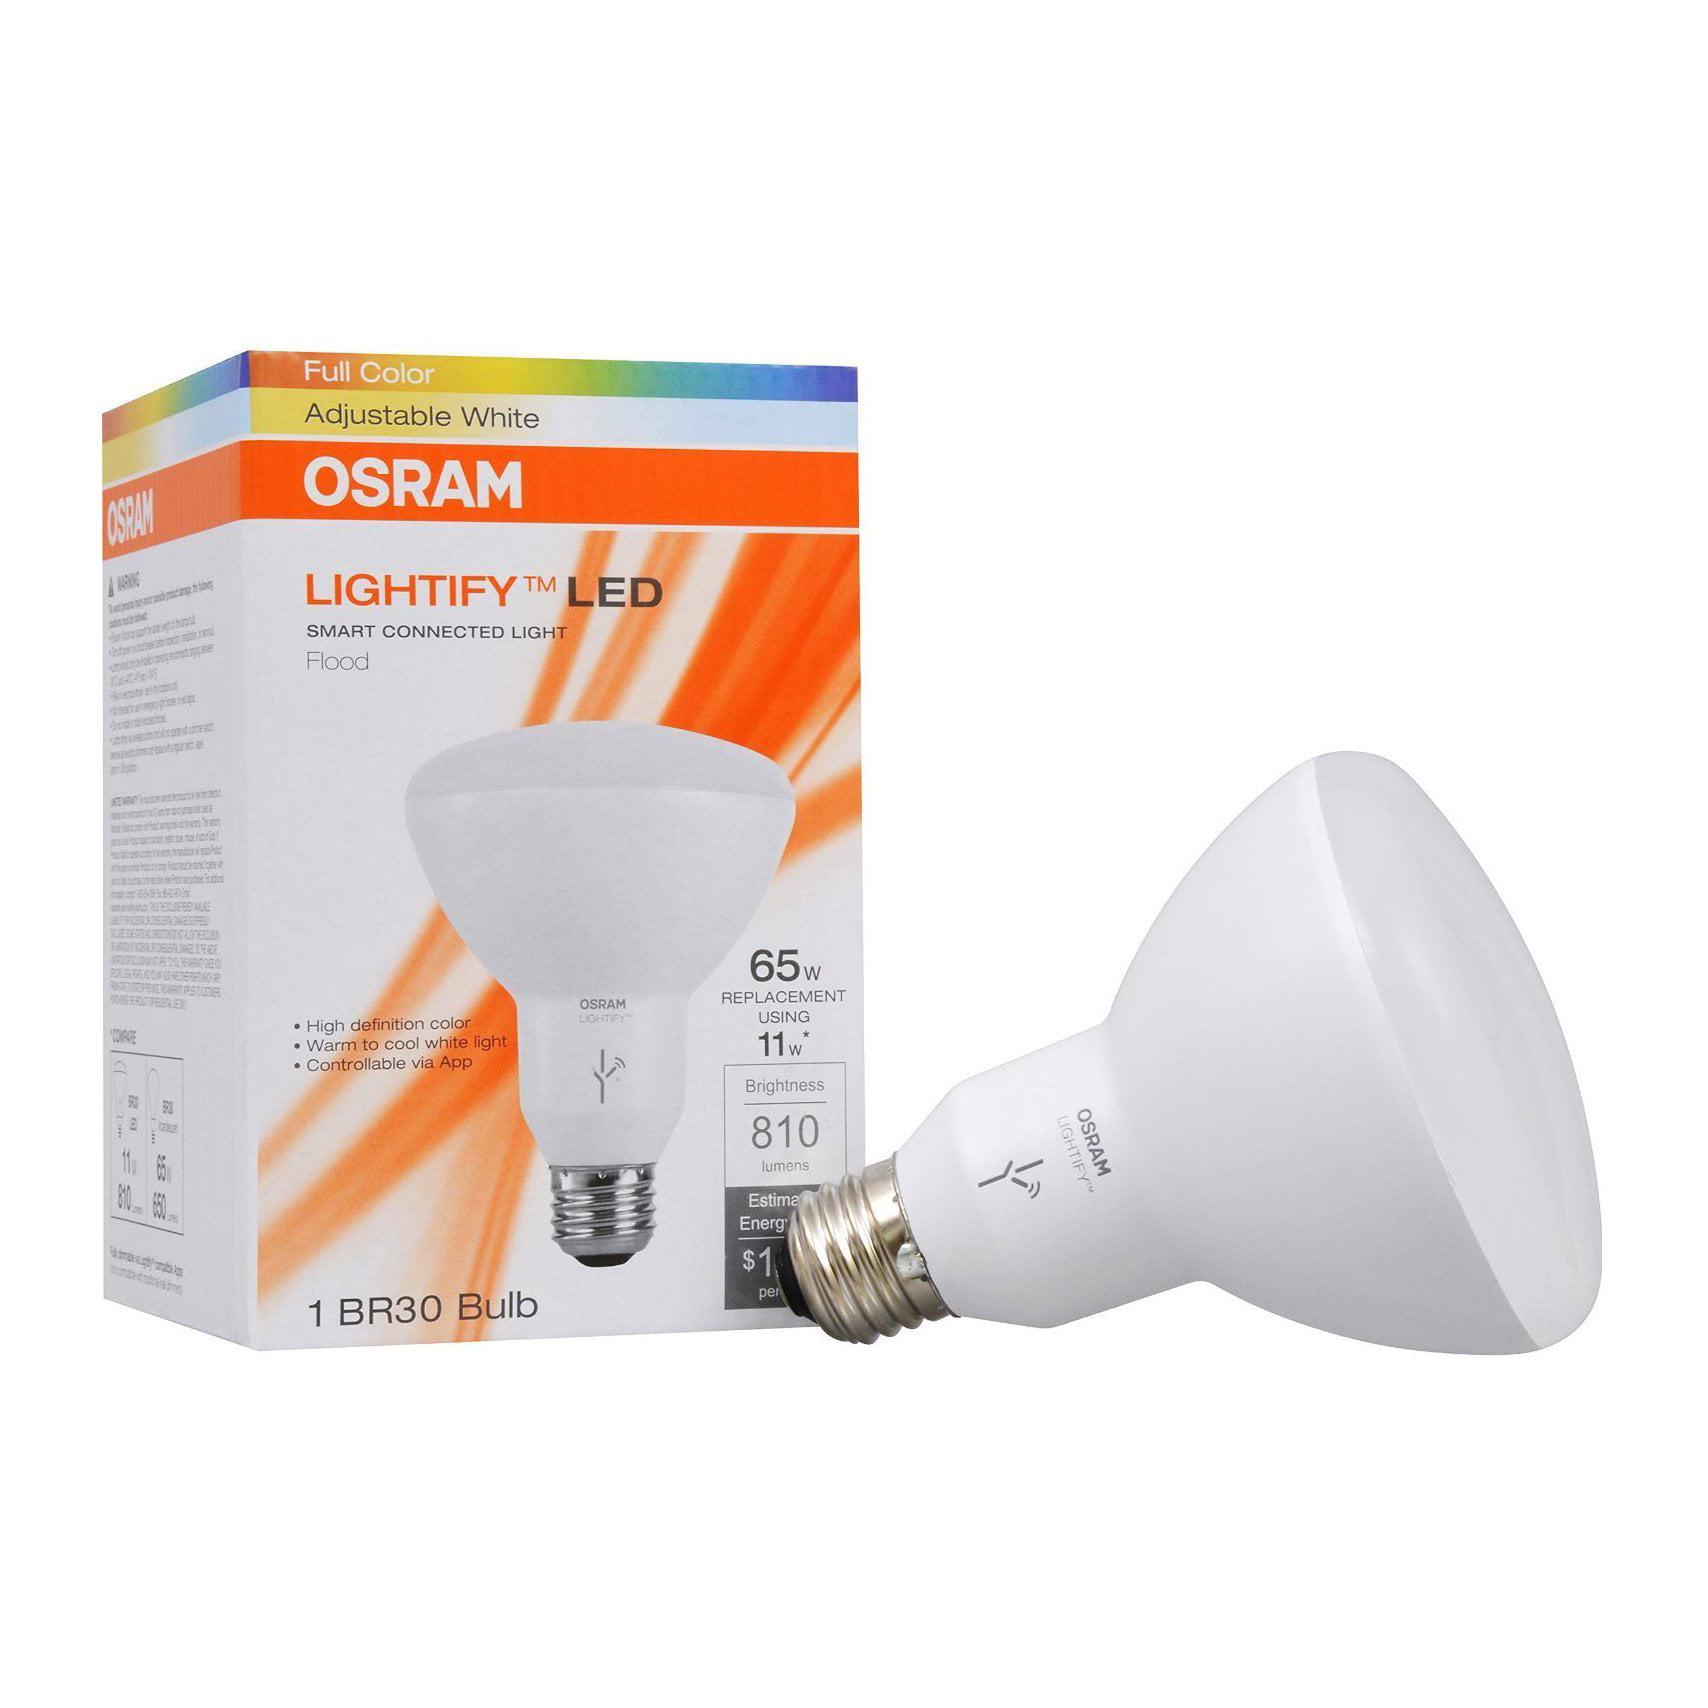 Sylvania Osram Lightify Smart Home 65W BR30 White/ Color LED Light Bulb (6 Pack) - image 1 of 9